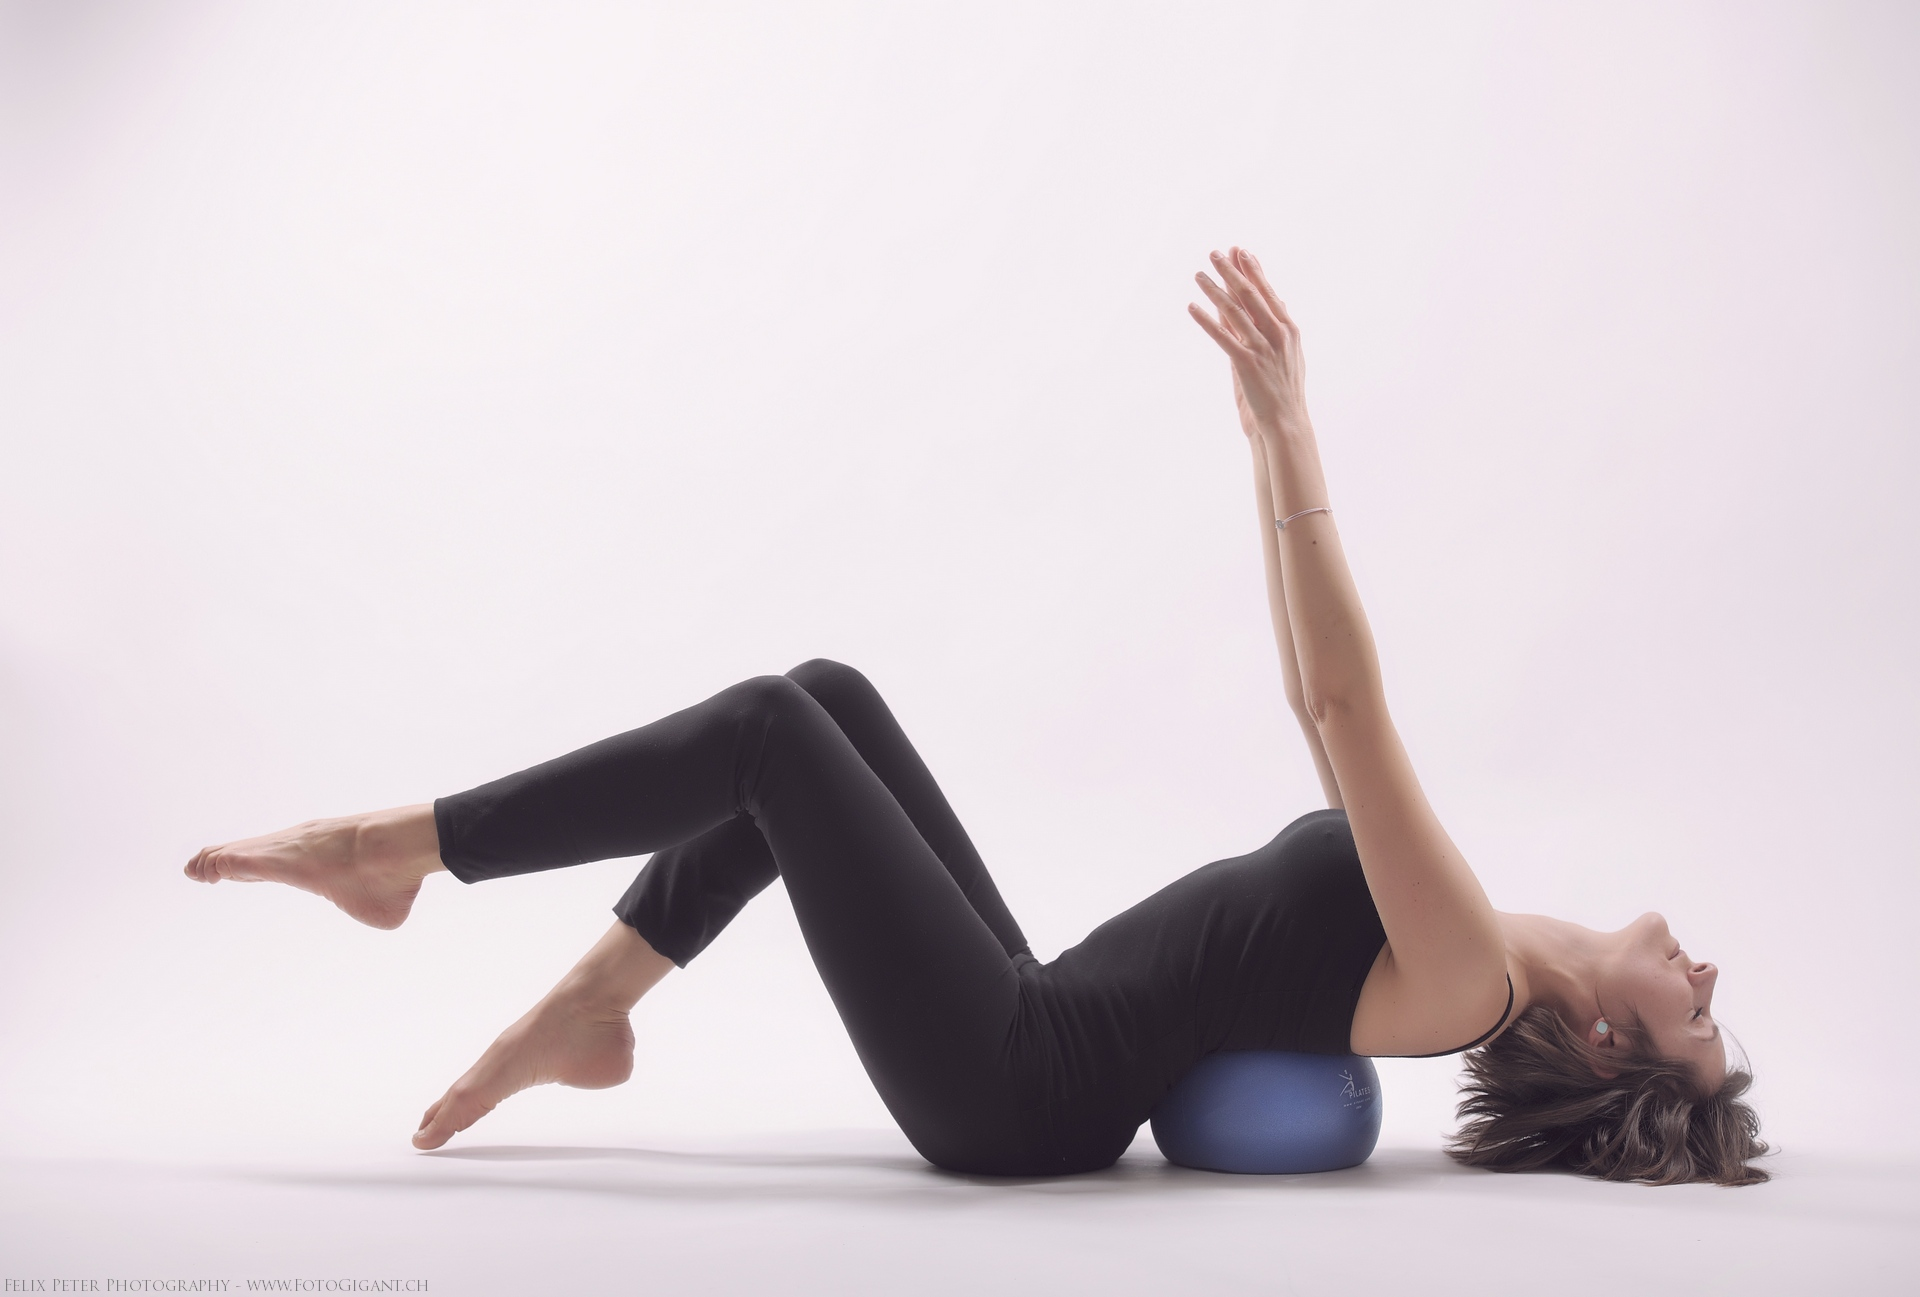 Felix-Peter-Yoga-Pilates-Dance-Fotografie_Bern_094.jpg